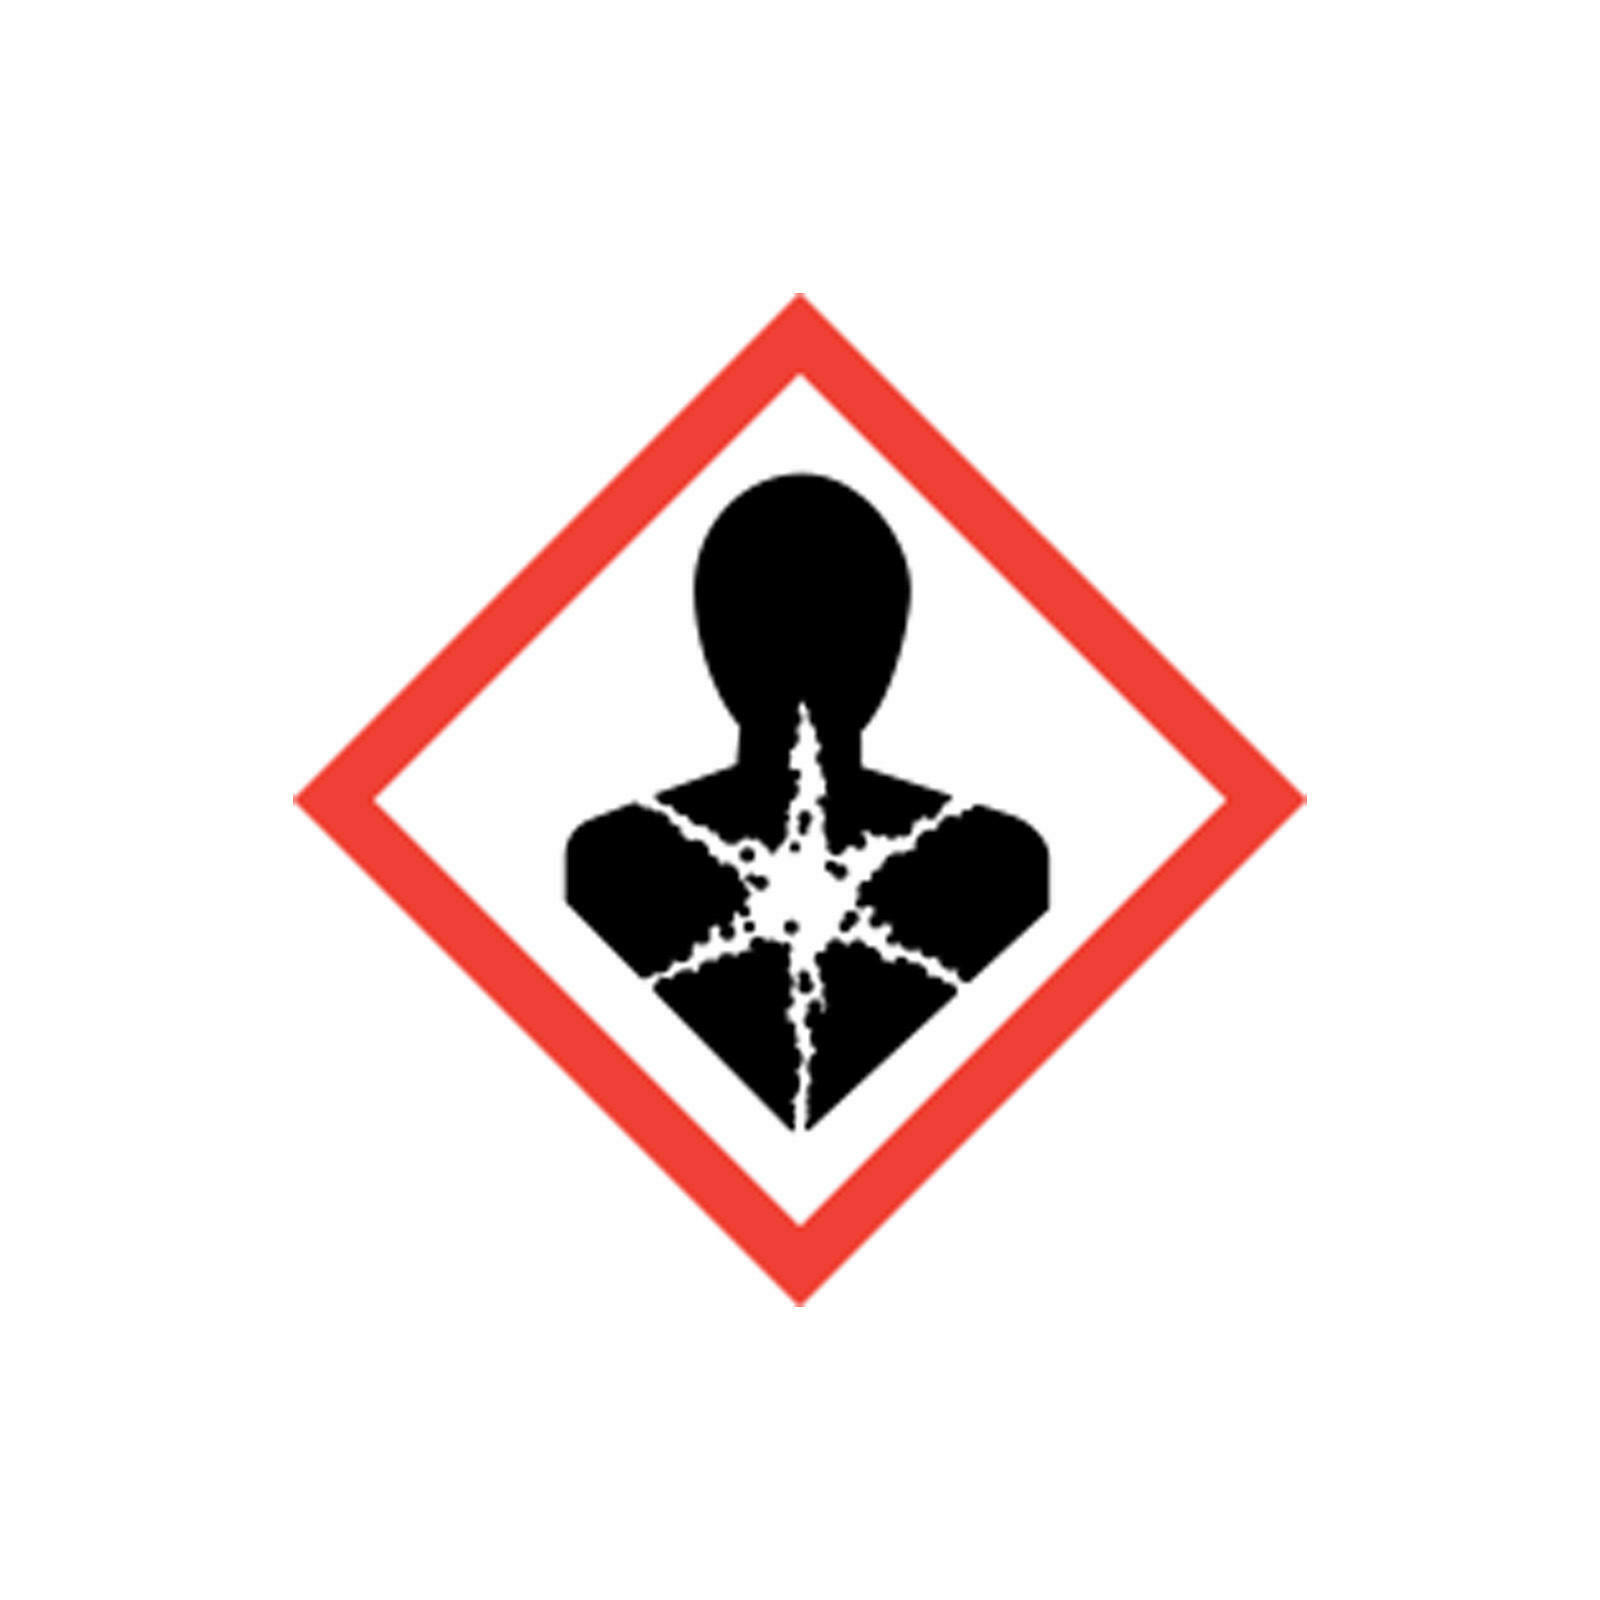 Mannol Kühlerdicht 325ml Radiator Leak-Stop Kühlsystem Dichtmittel Leckstop